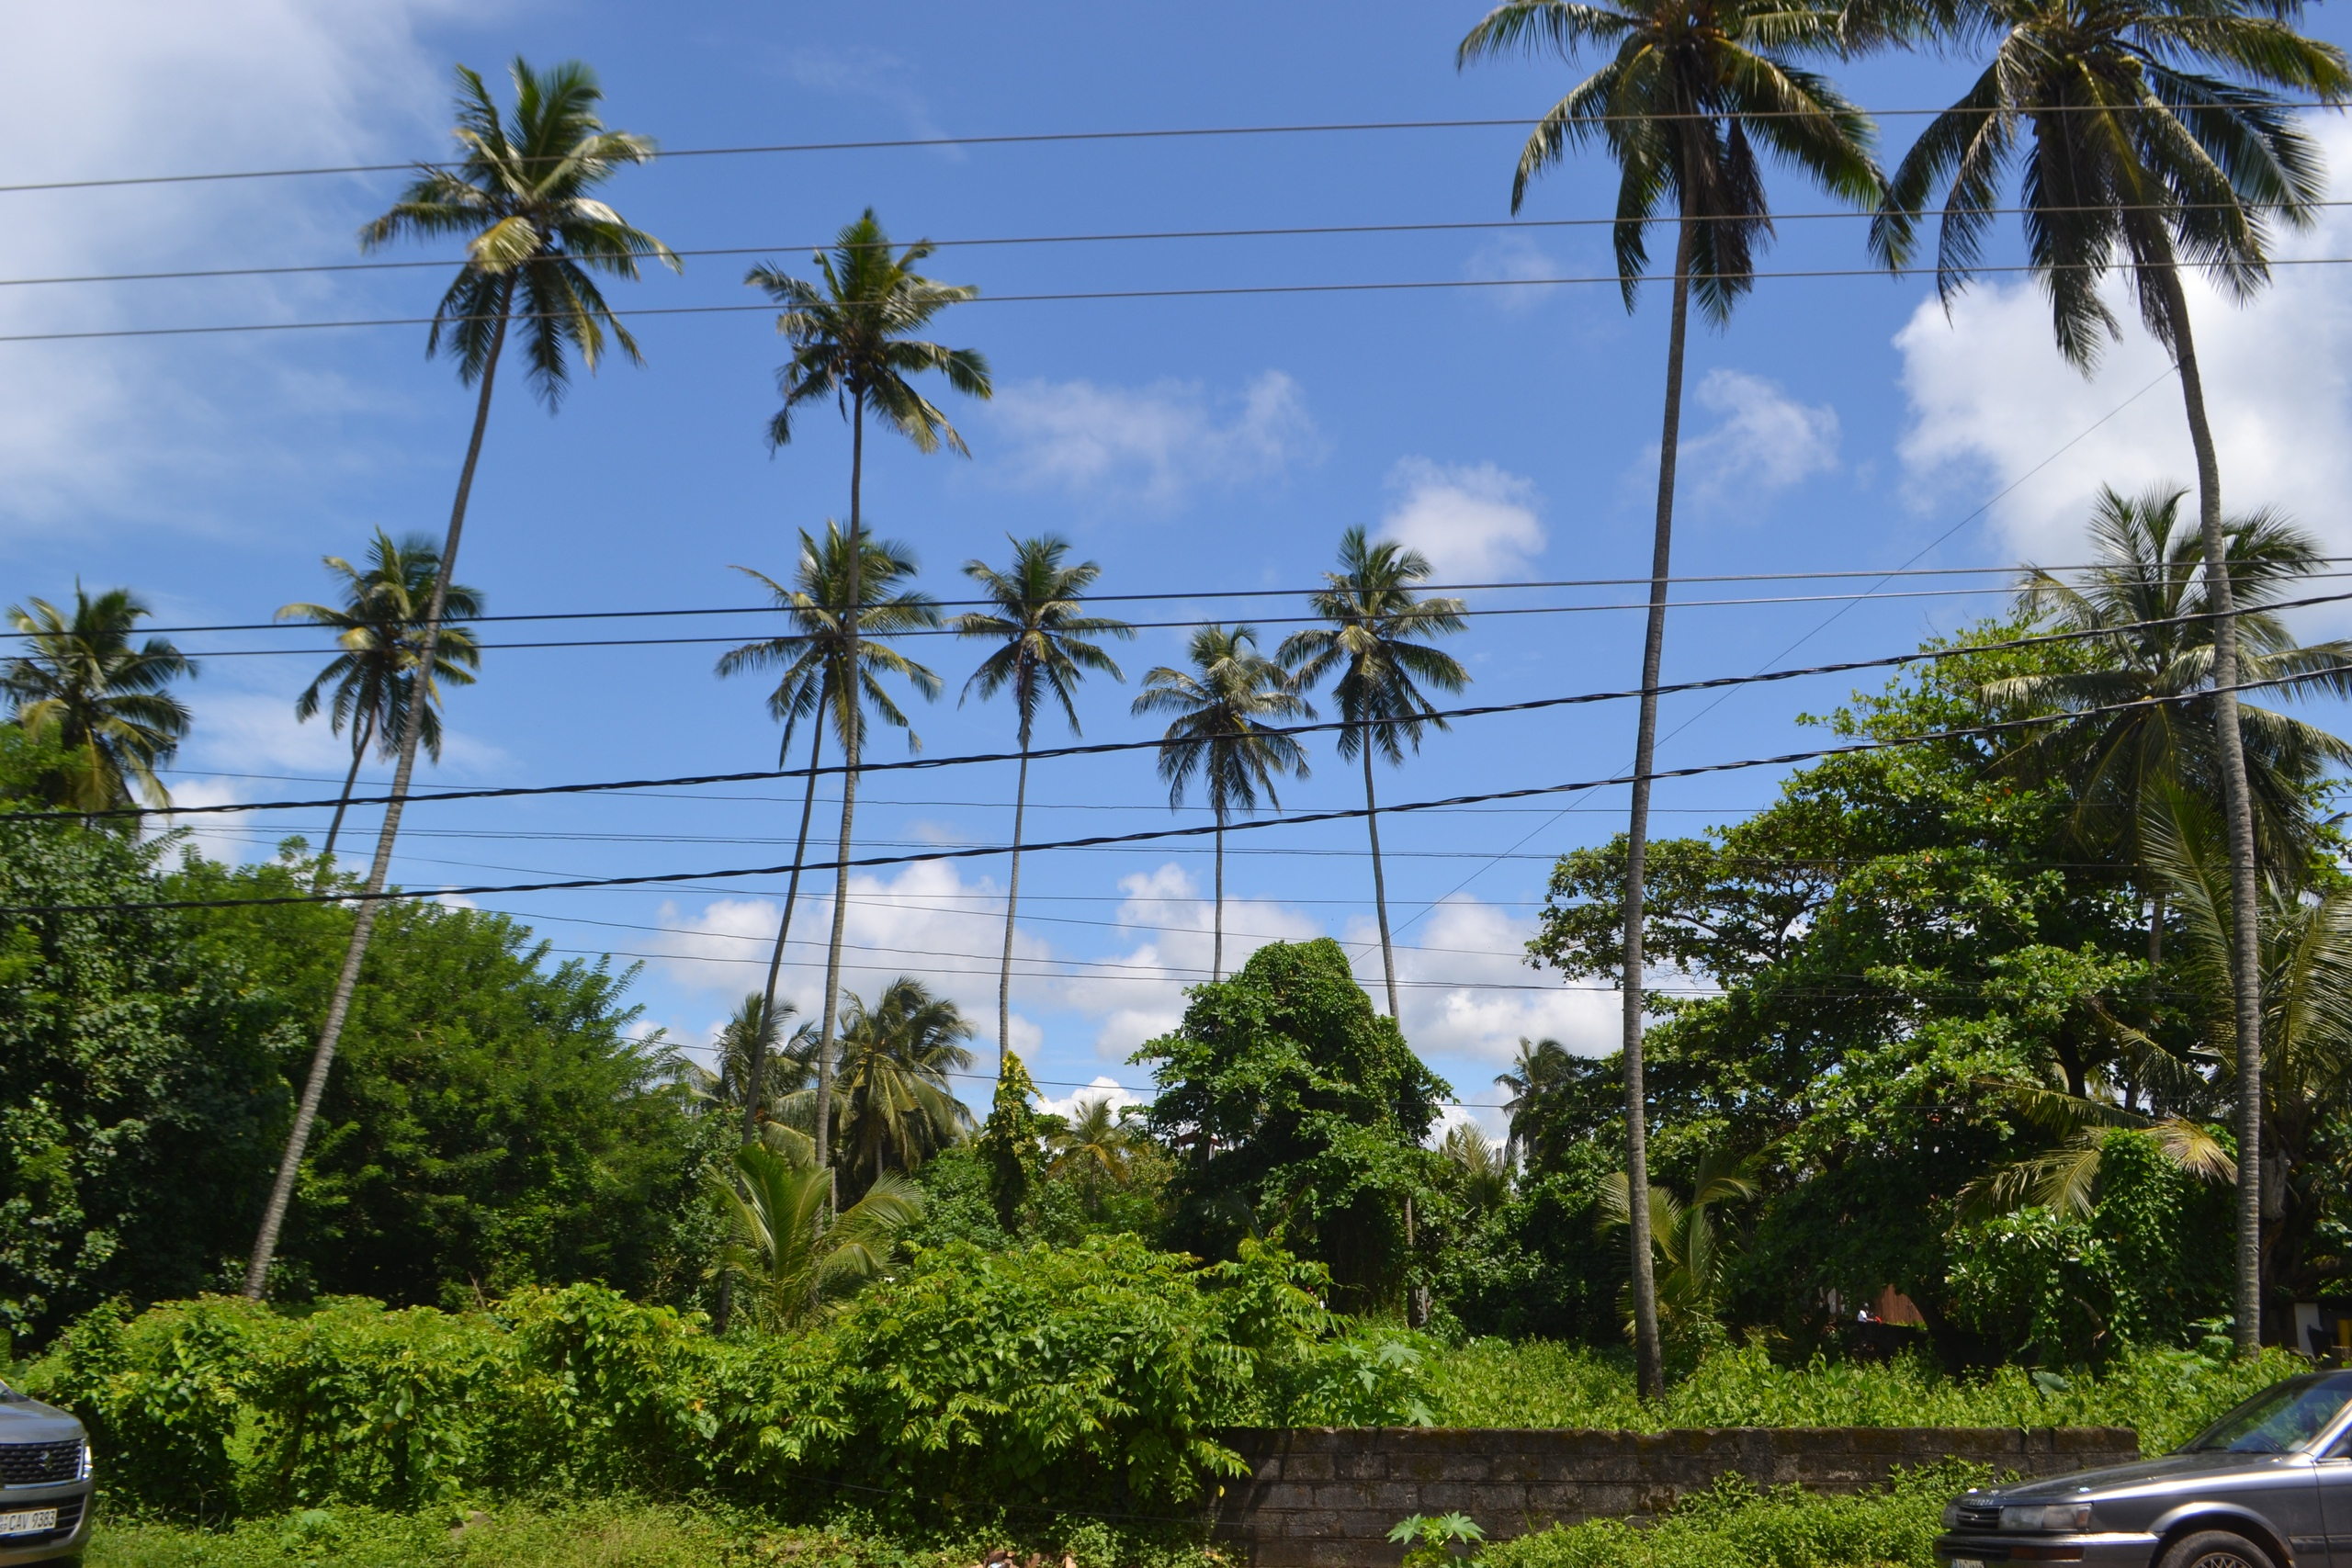 Шри Ланка (фото) SwK19j5MwVQ